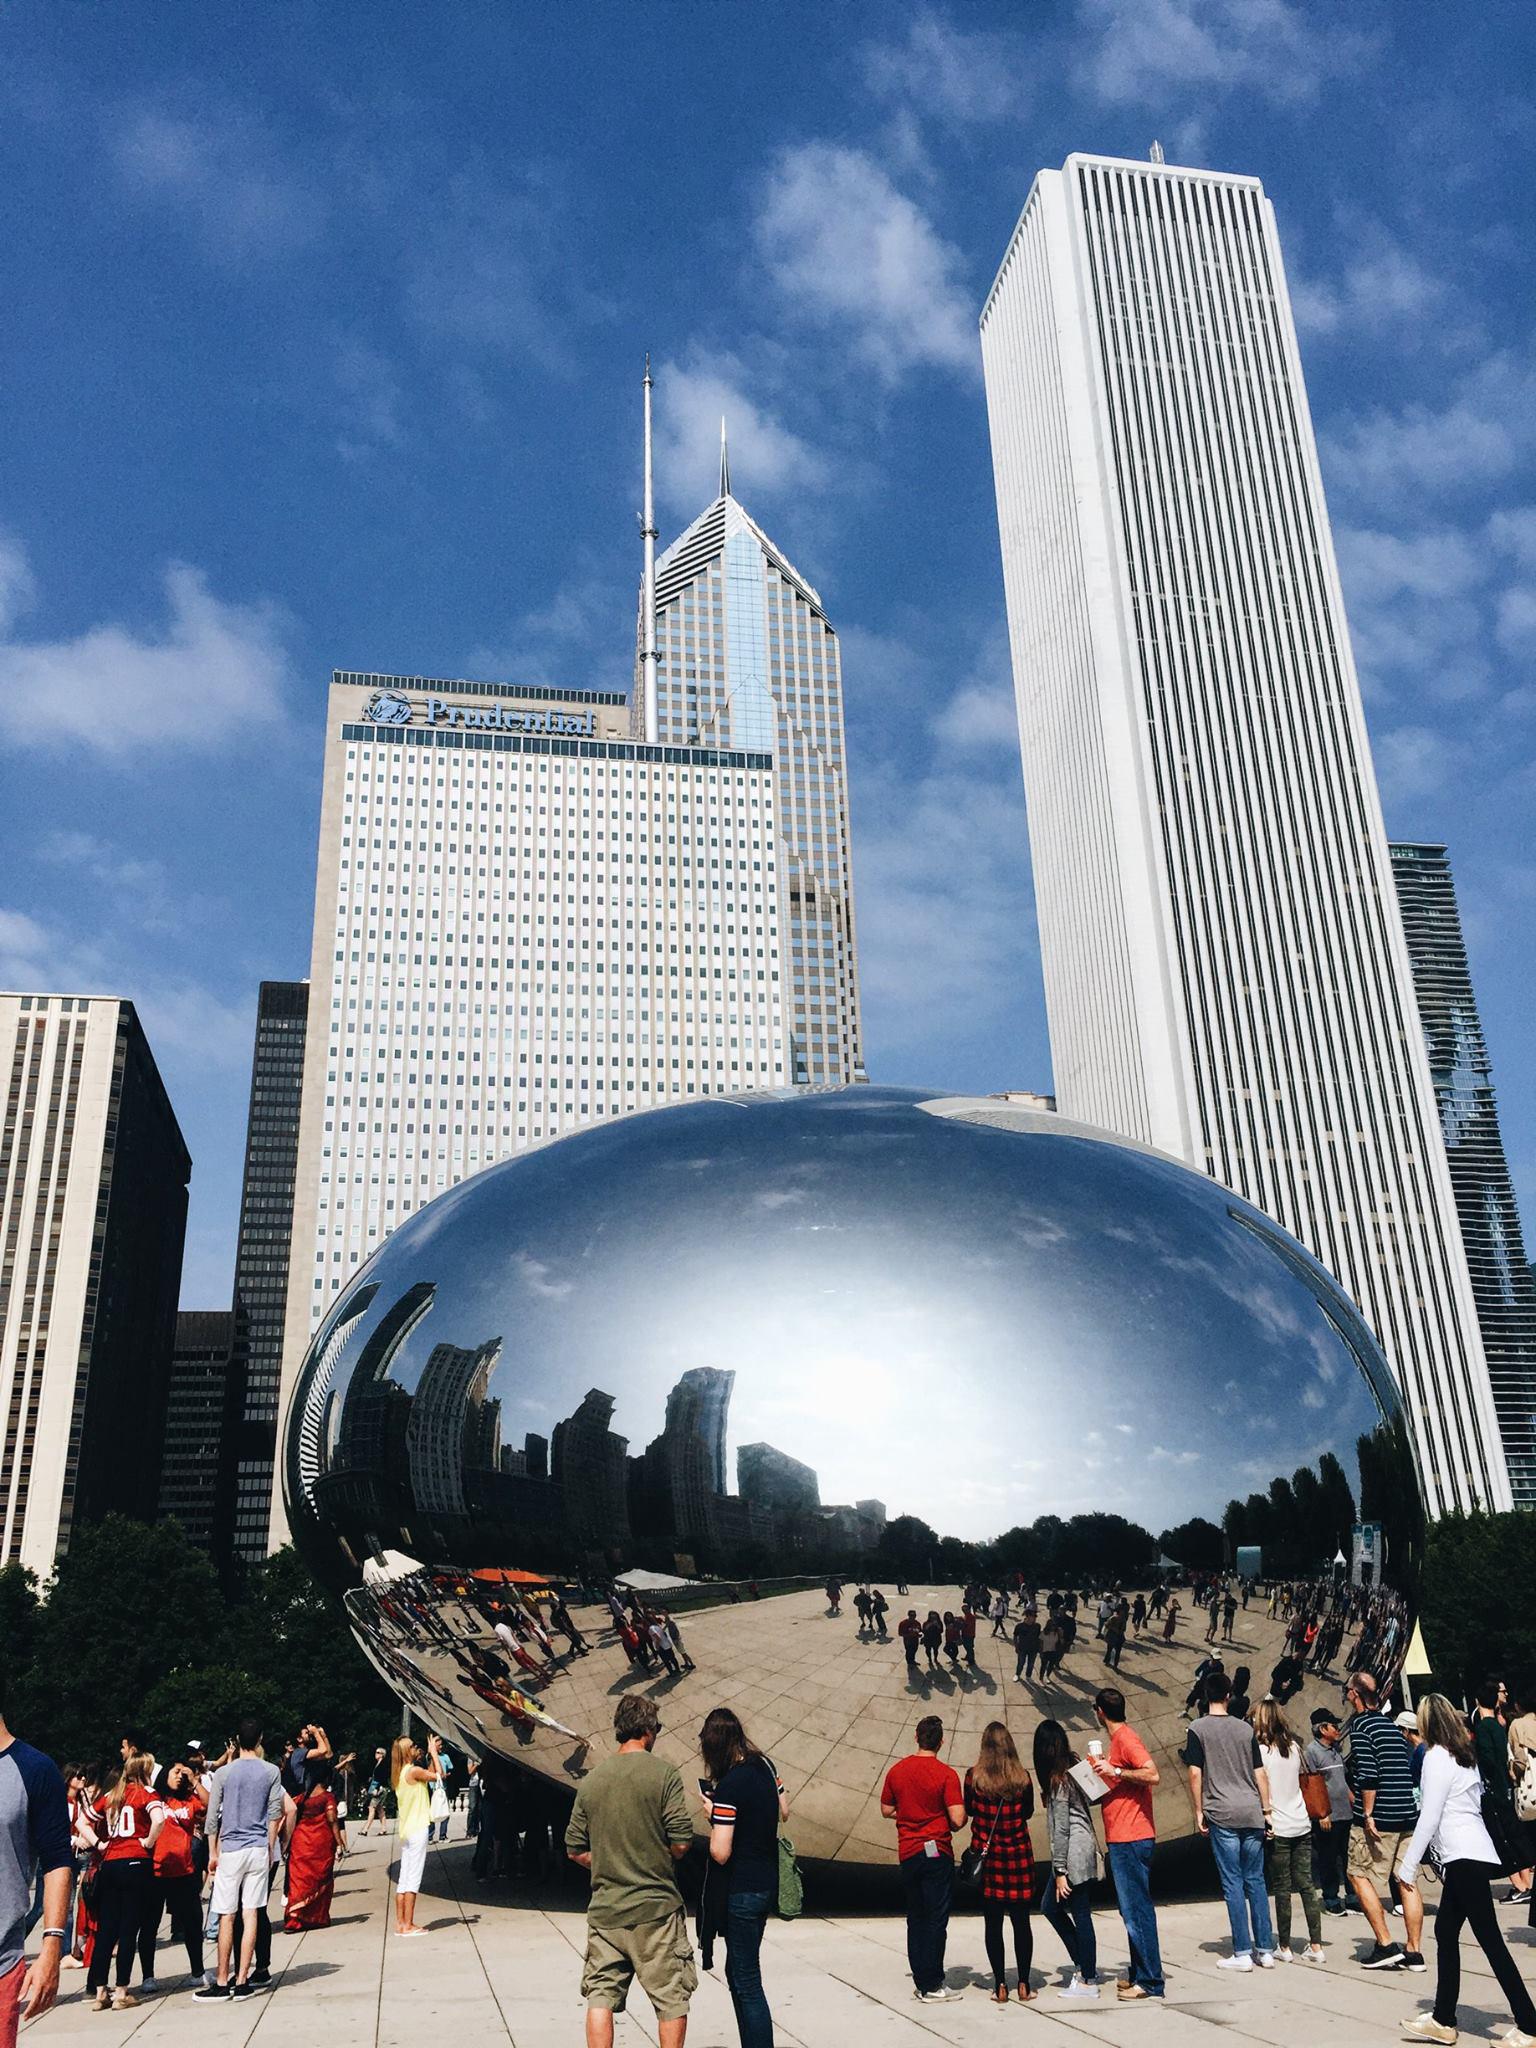 The-Bean-at-Millennium-Park-Chicago-Illinois.png